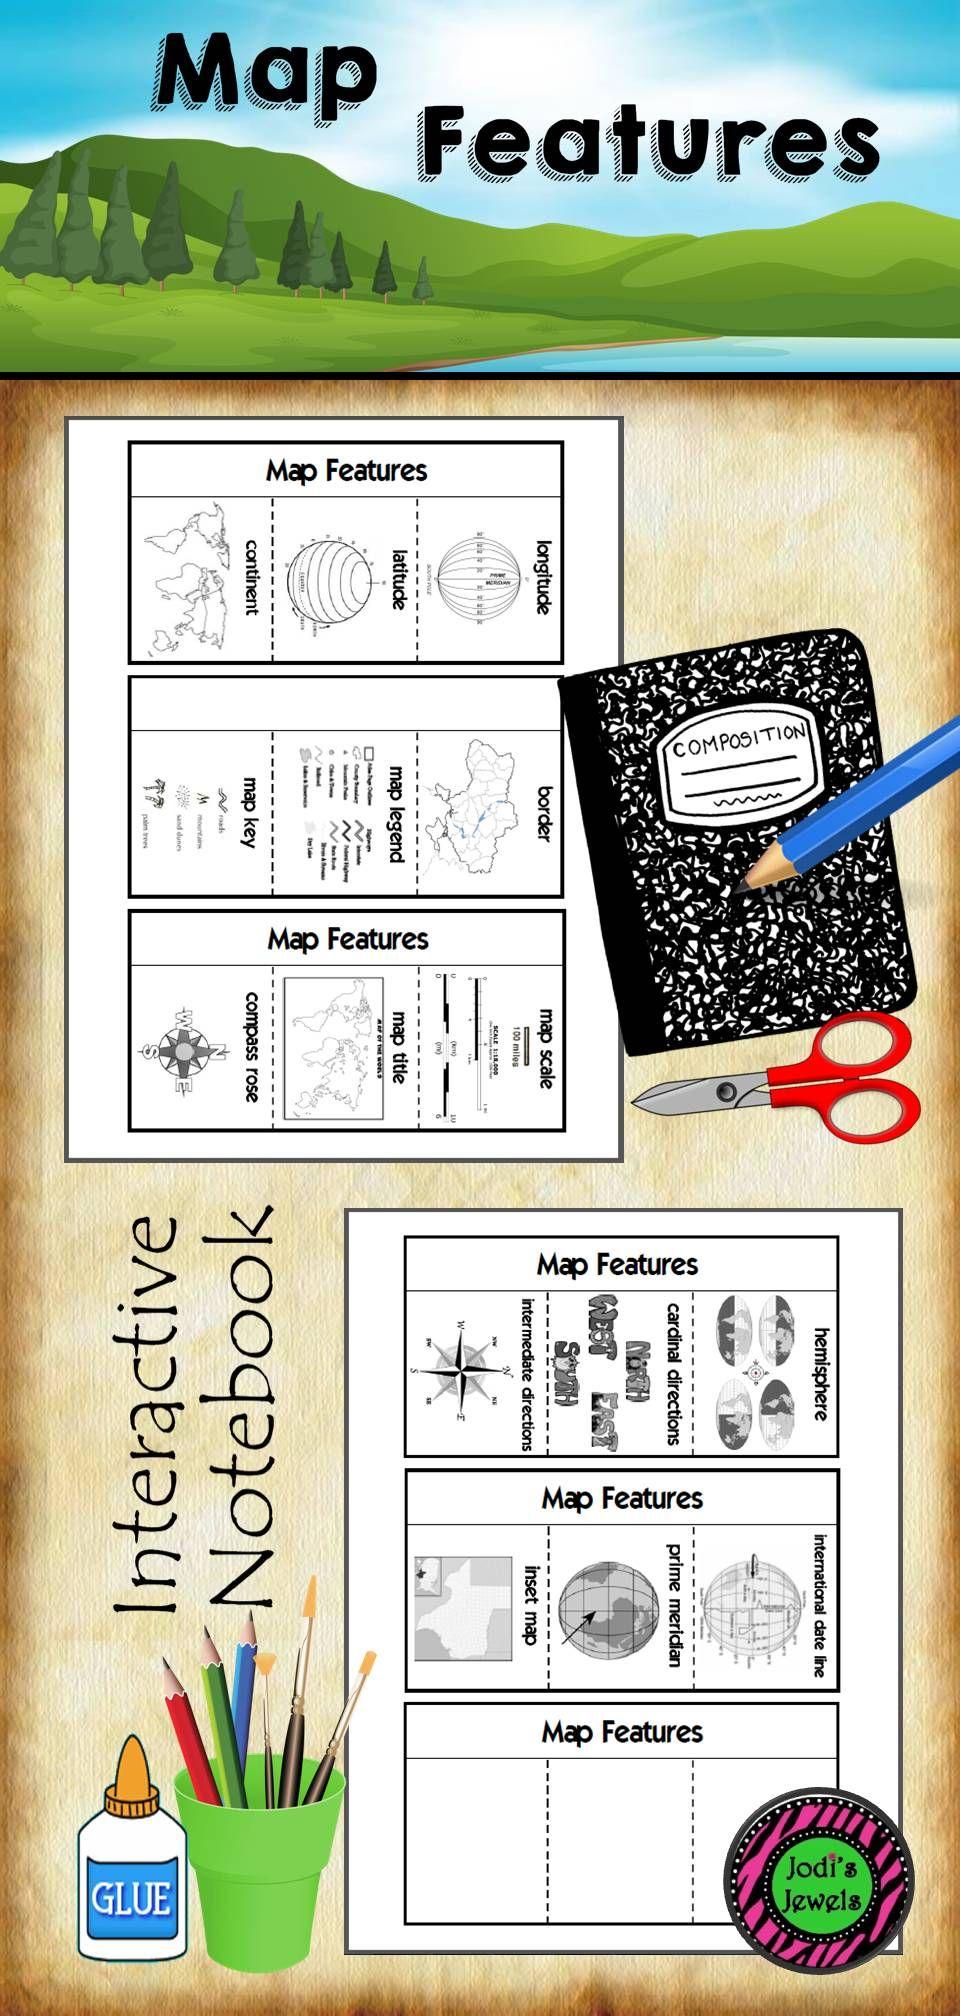 Map Features Interactive Notebook | school | Middle school